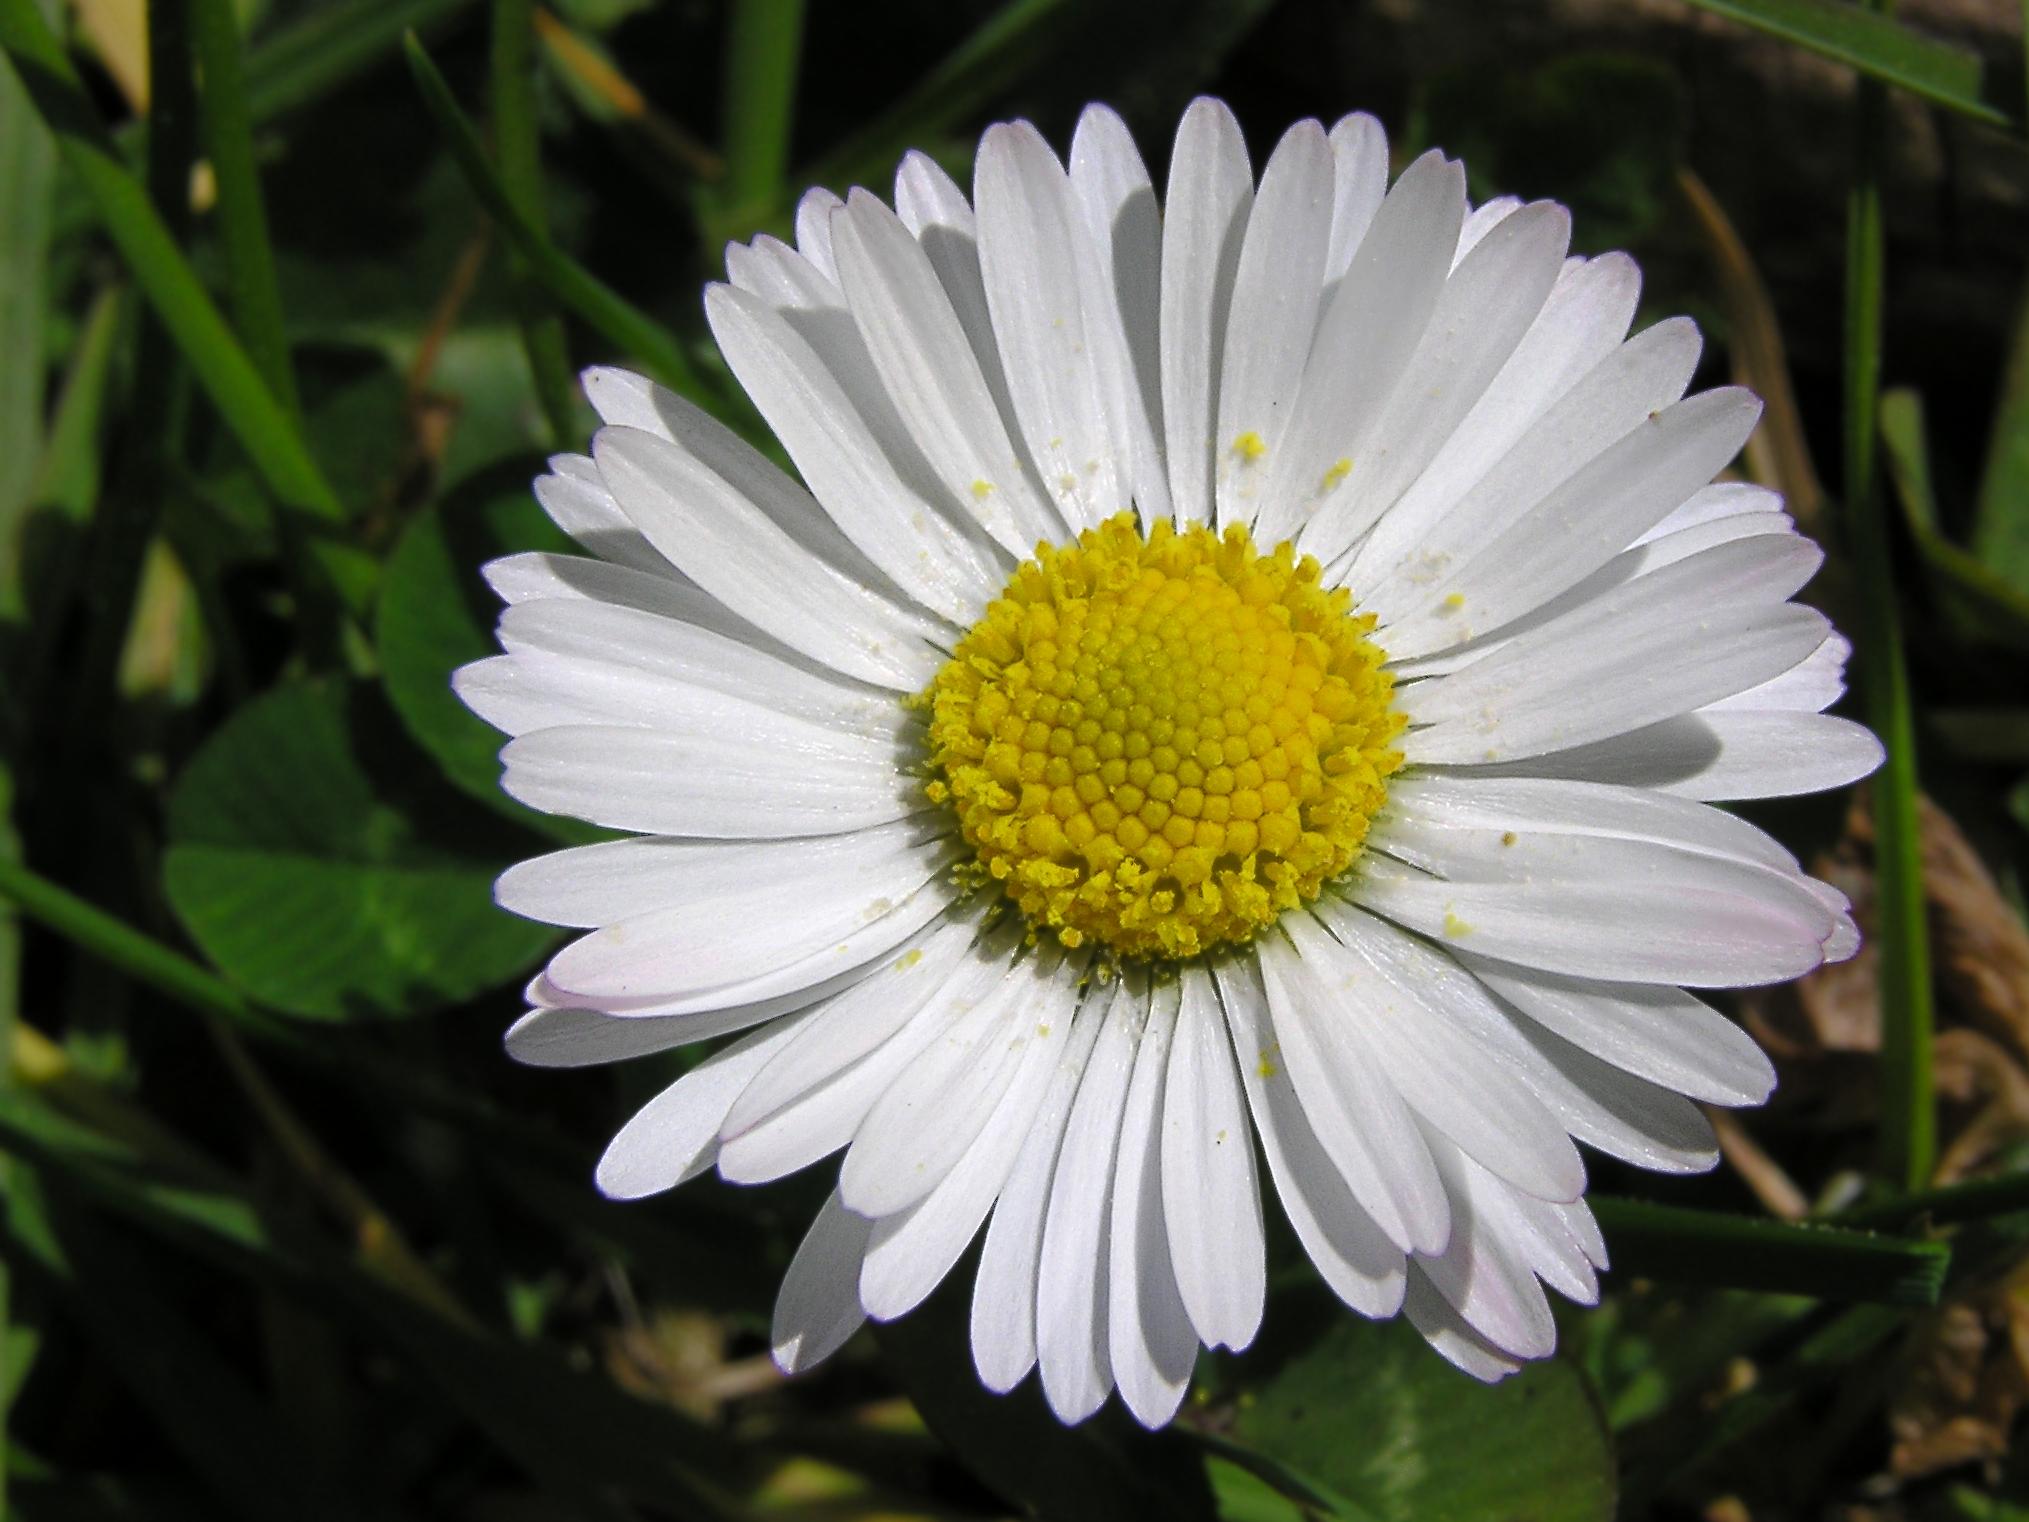 File:Lawn daisy.jpg - Wikimedia Commons